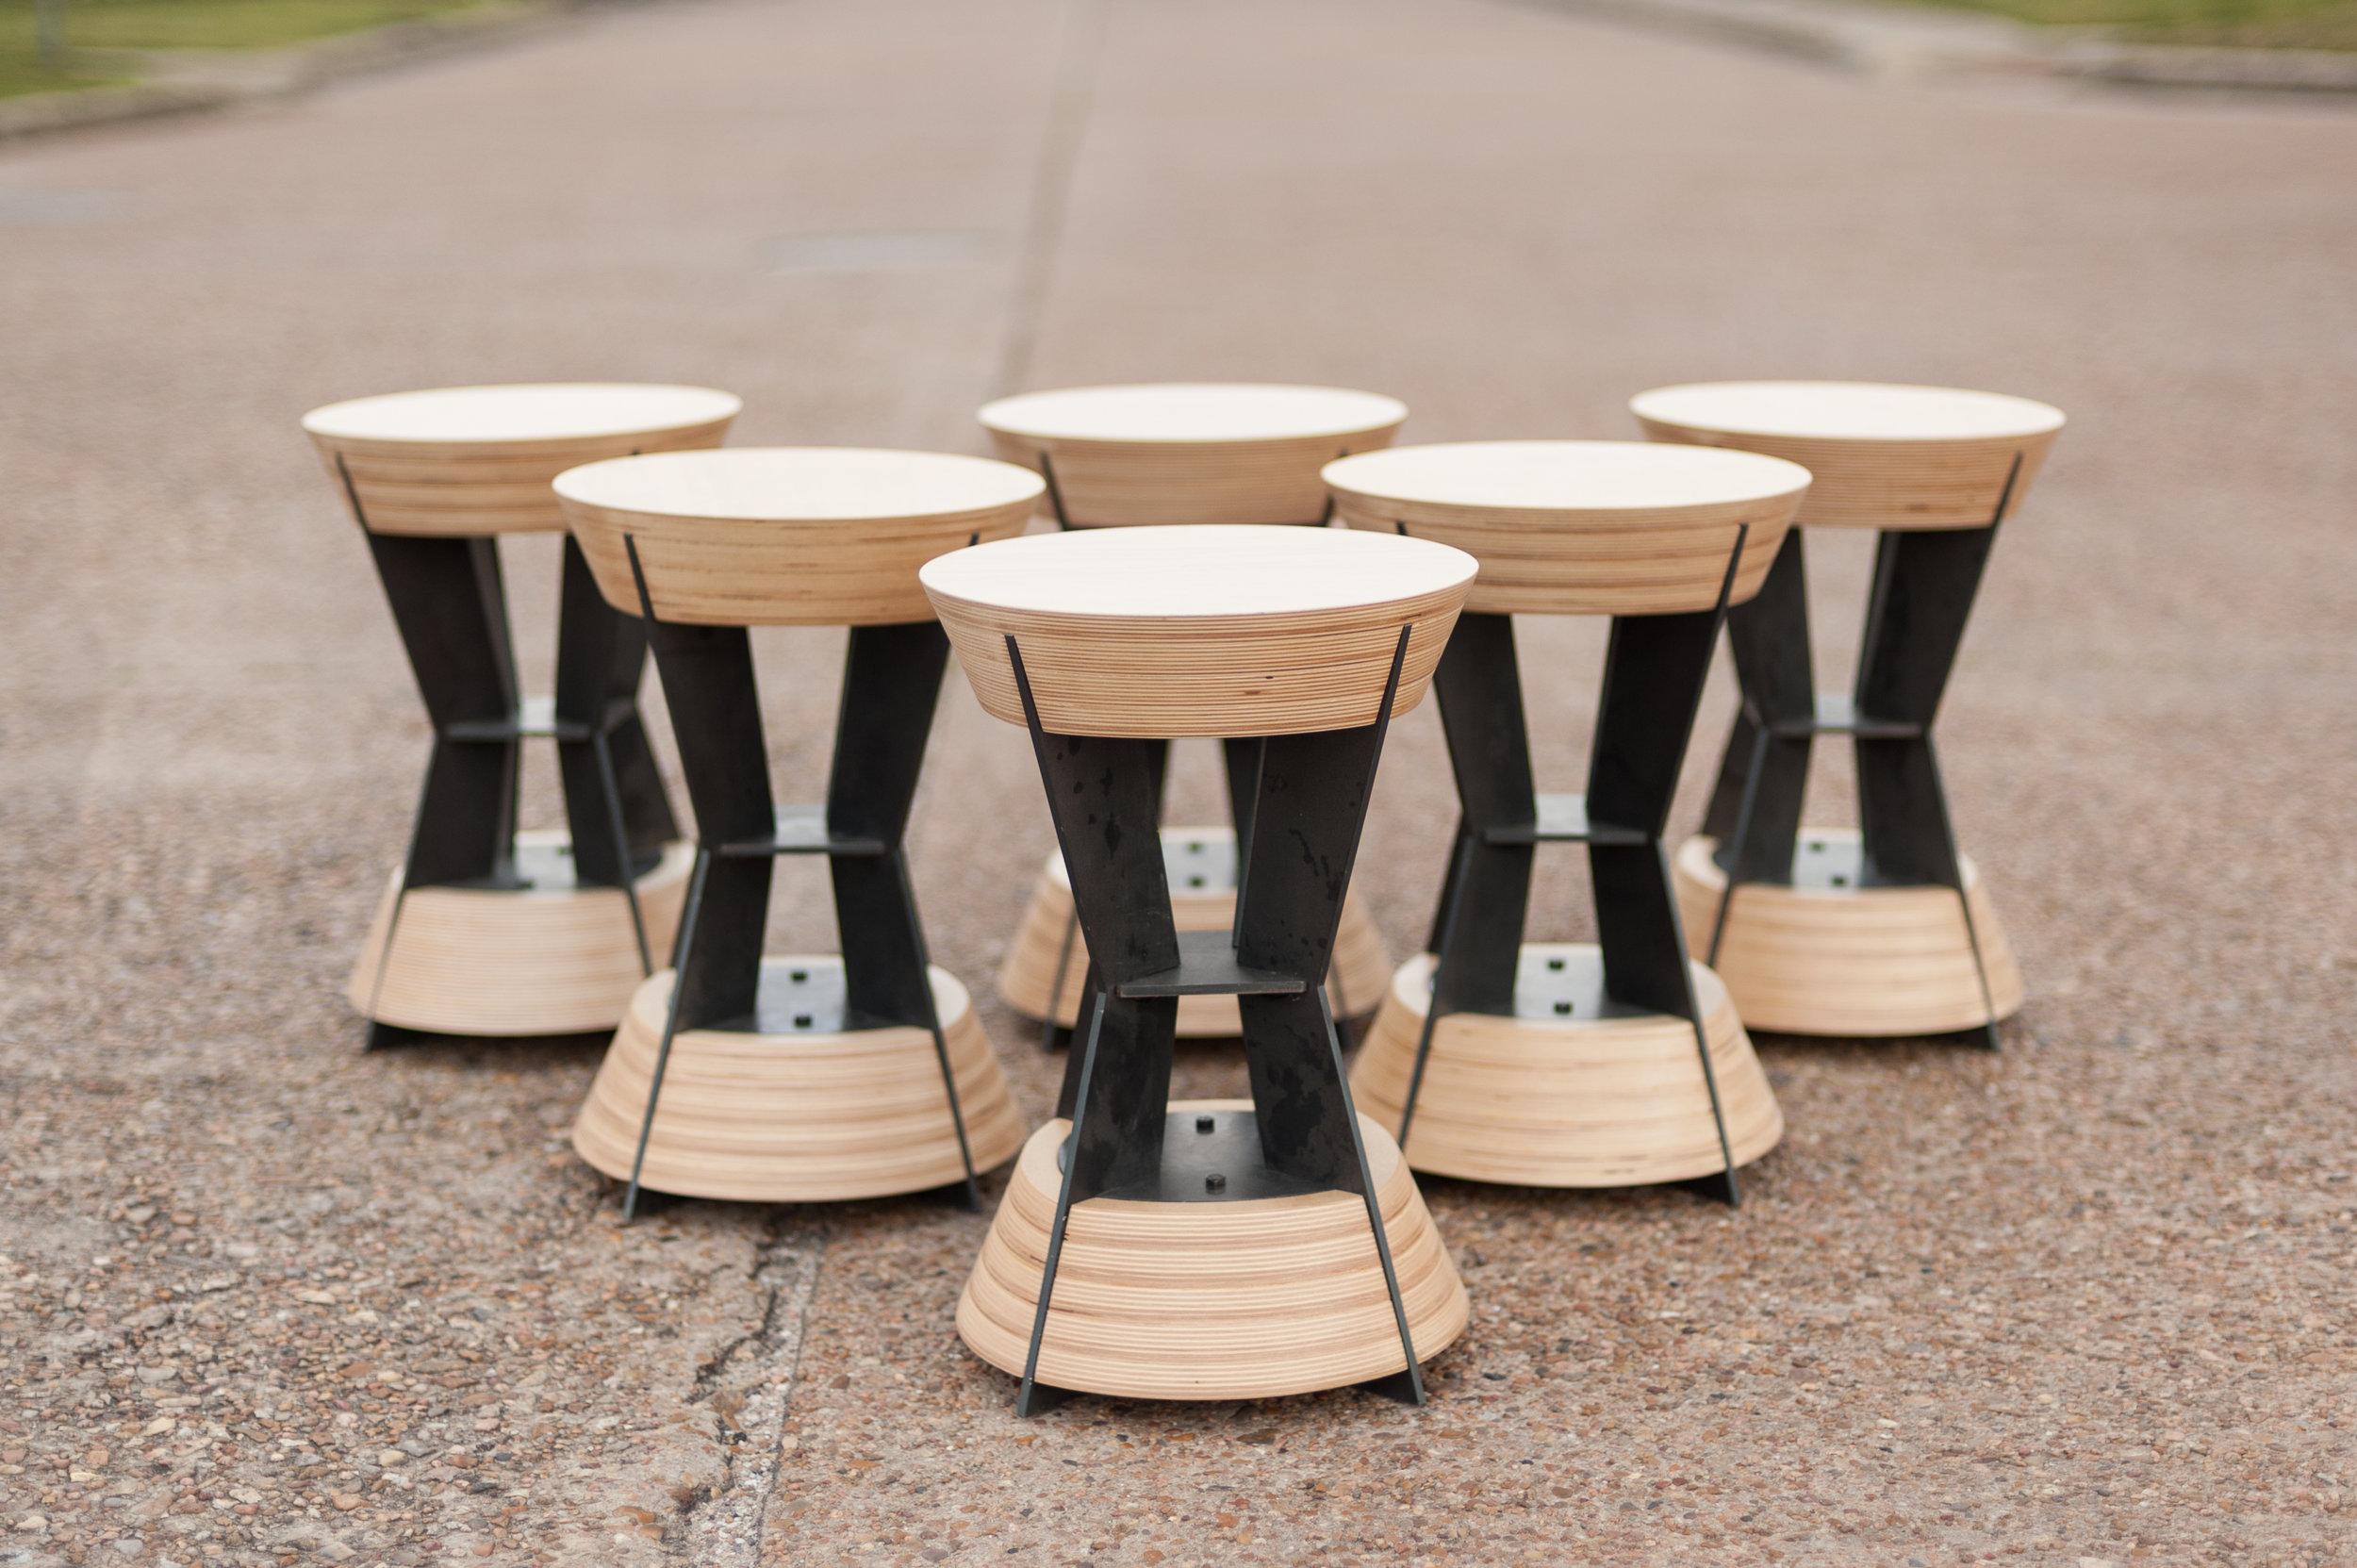 Hourglass stool